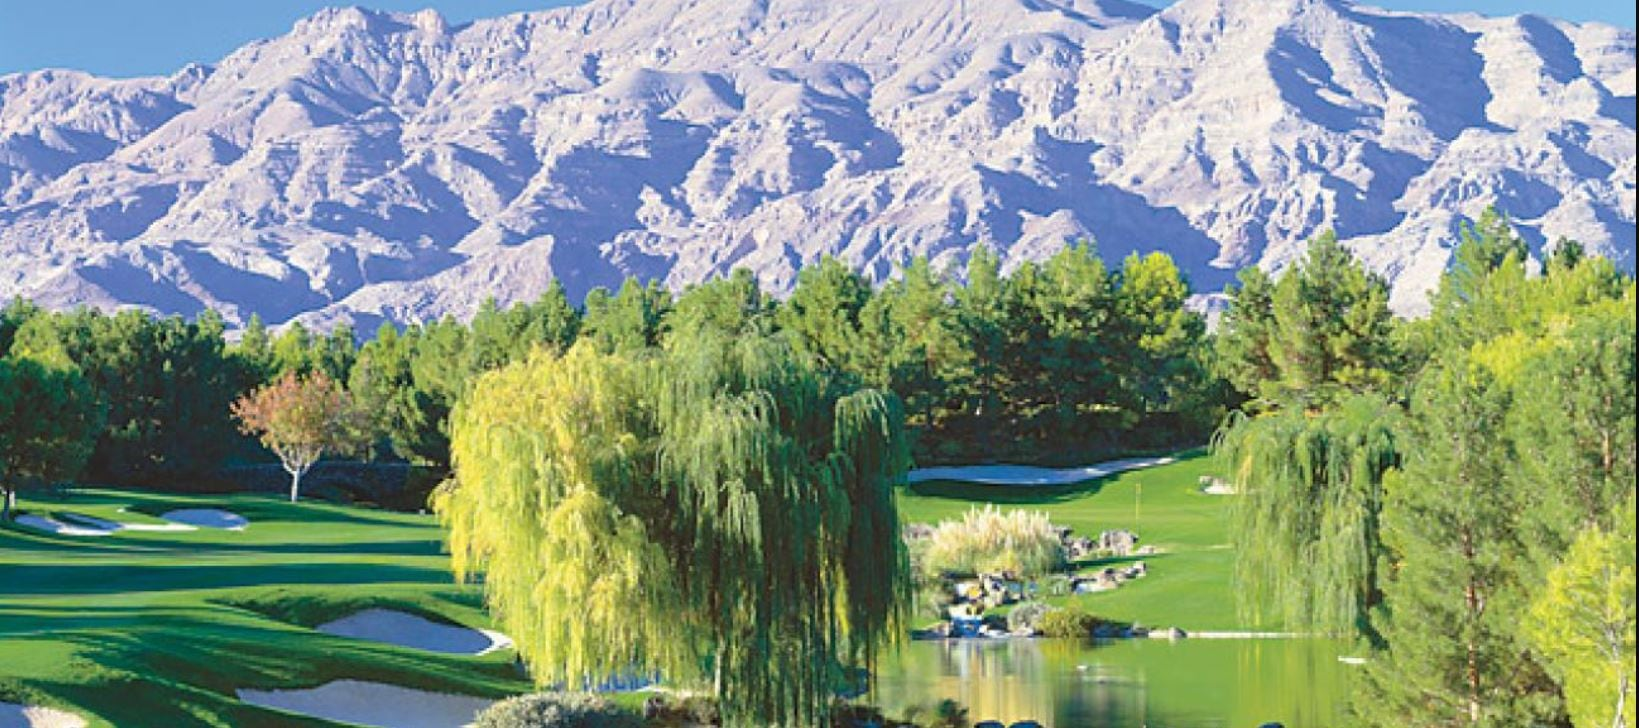 Expensive Golf Course